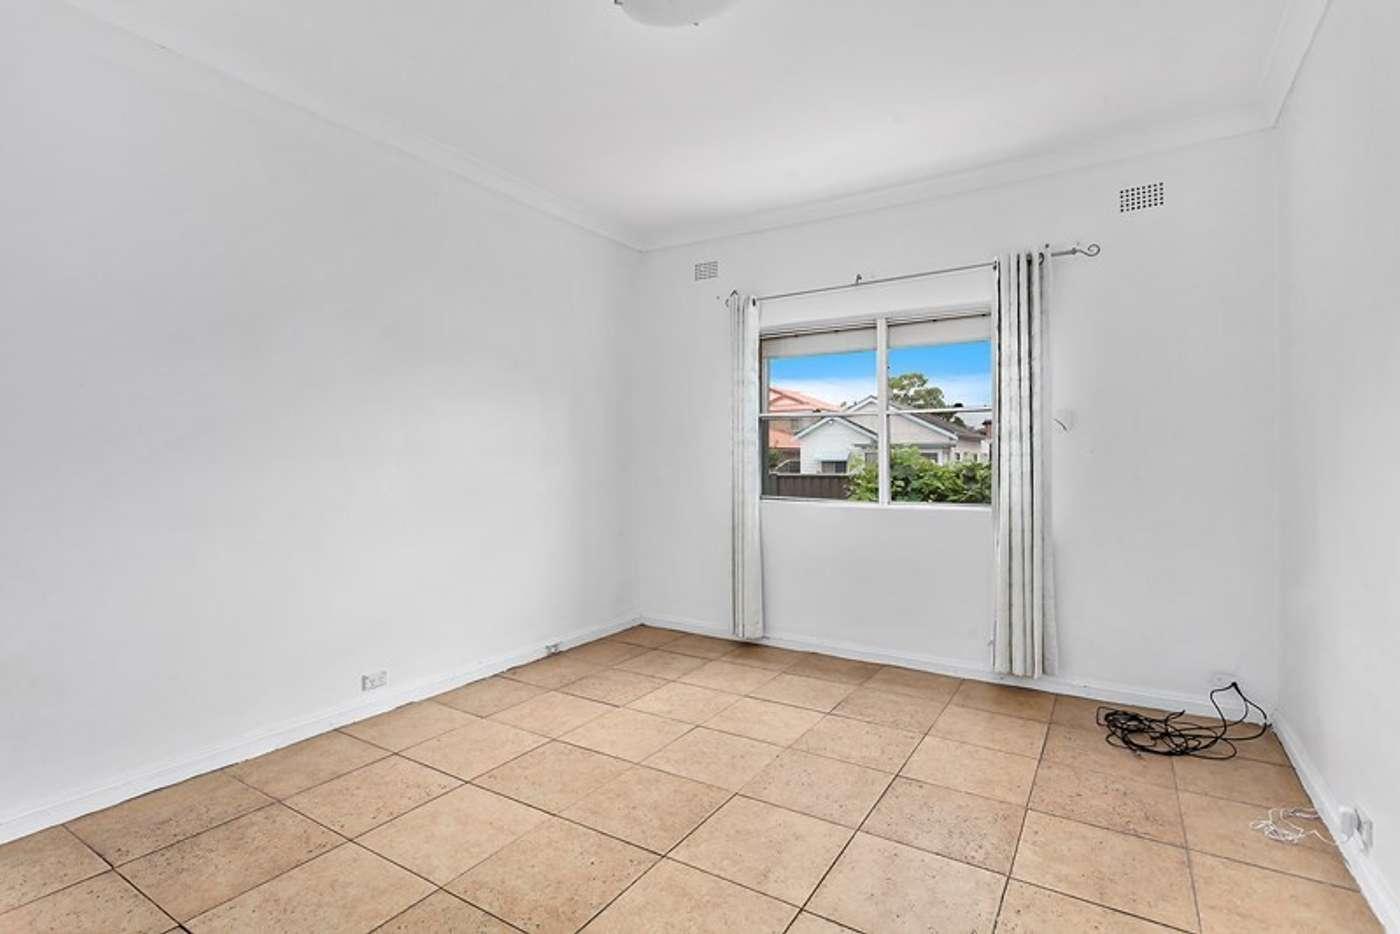 Fifth view of Homely house listing, 51 Orange Street, Hurstville NSW 2220